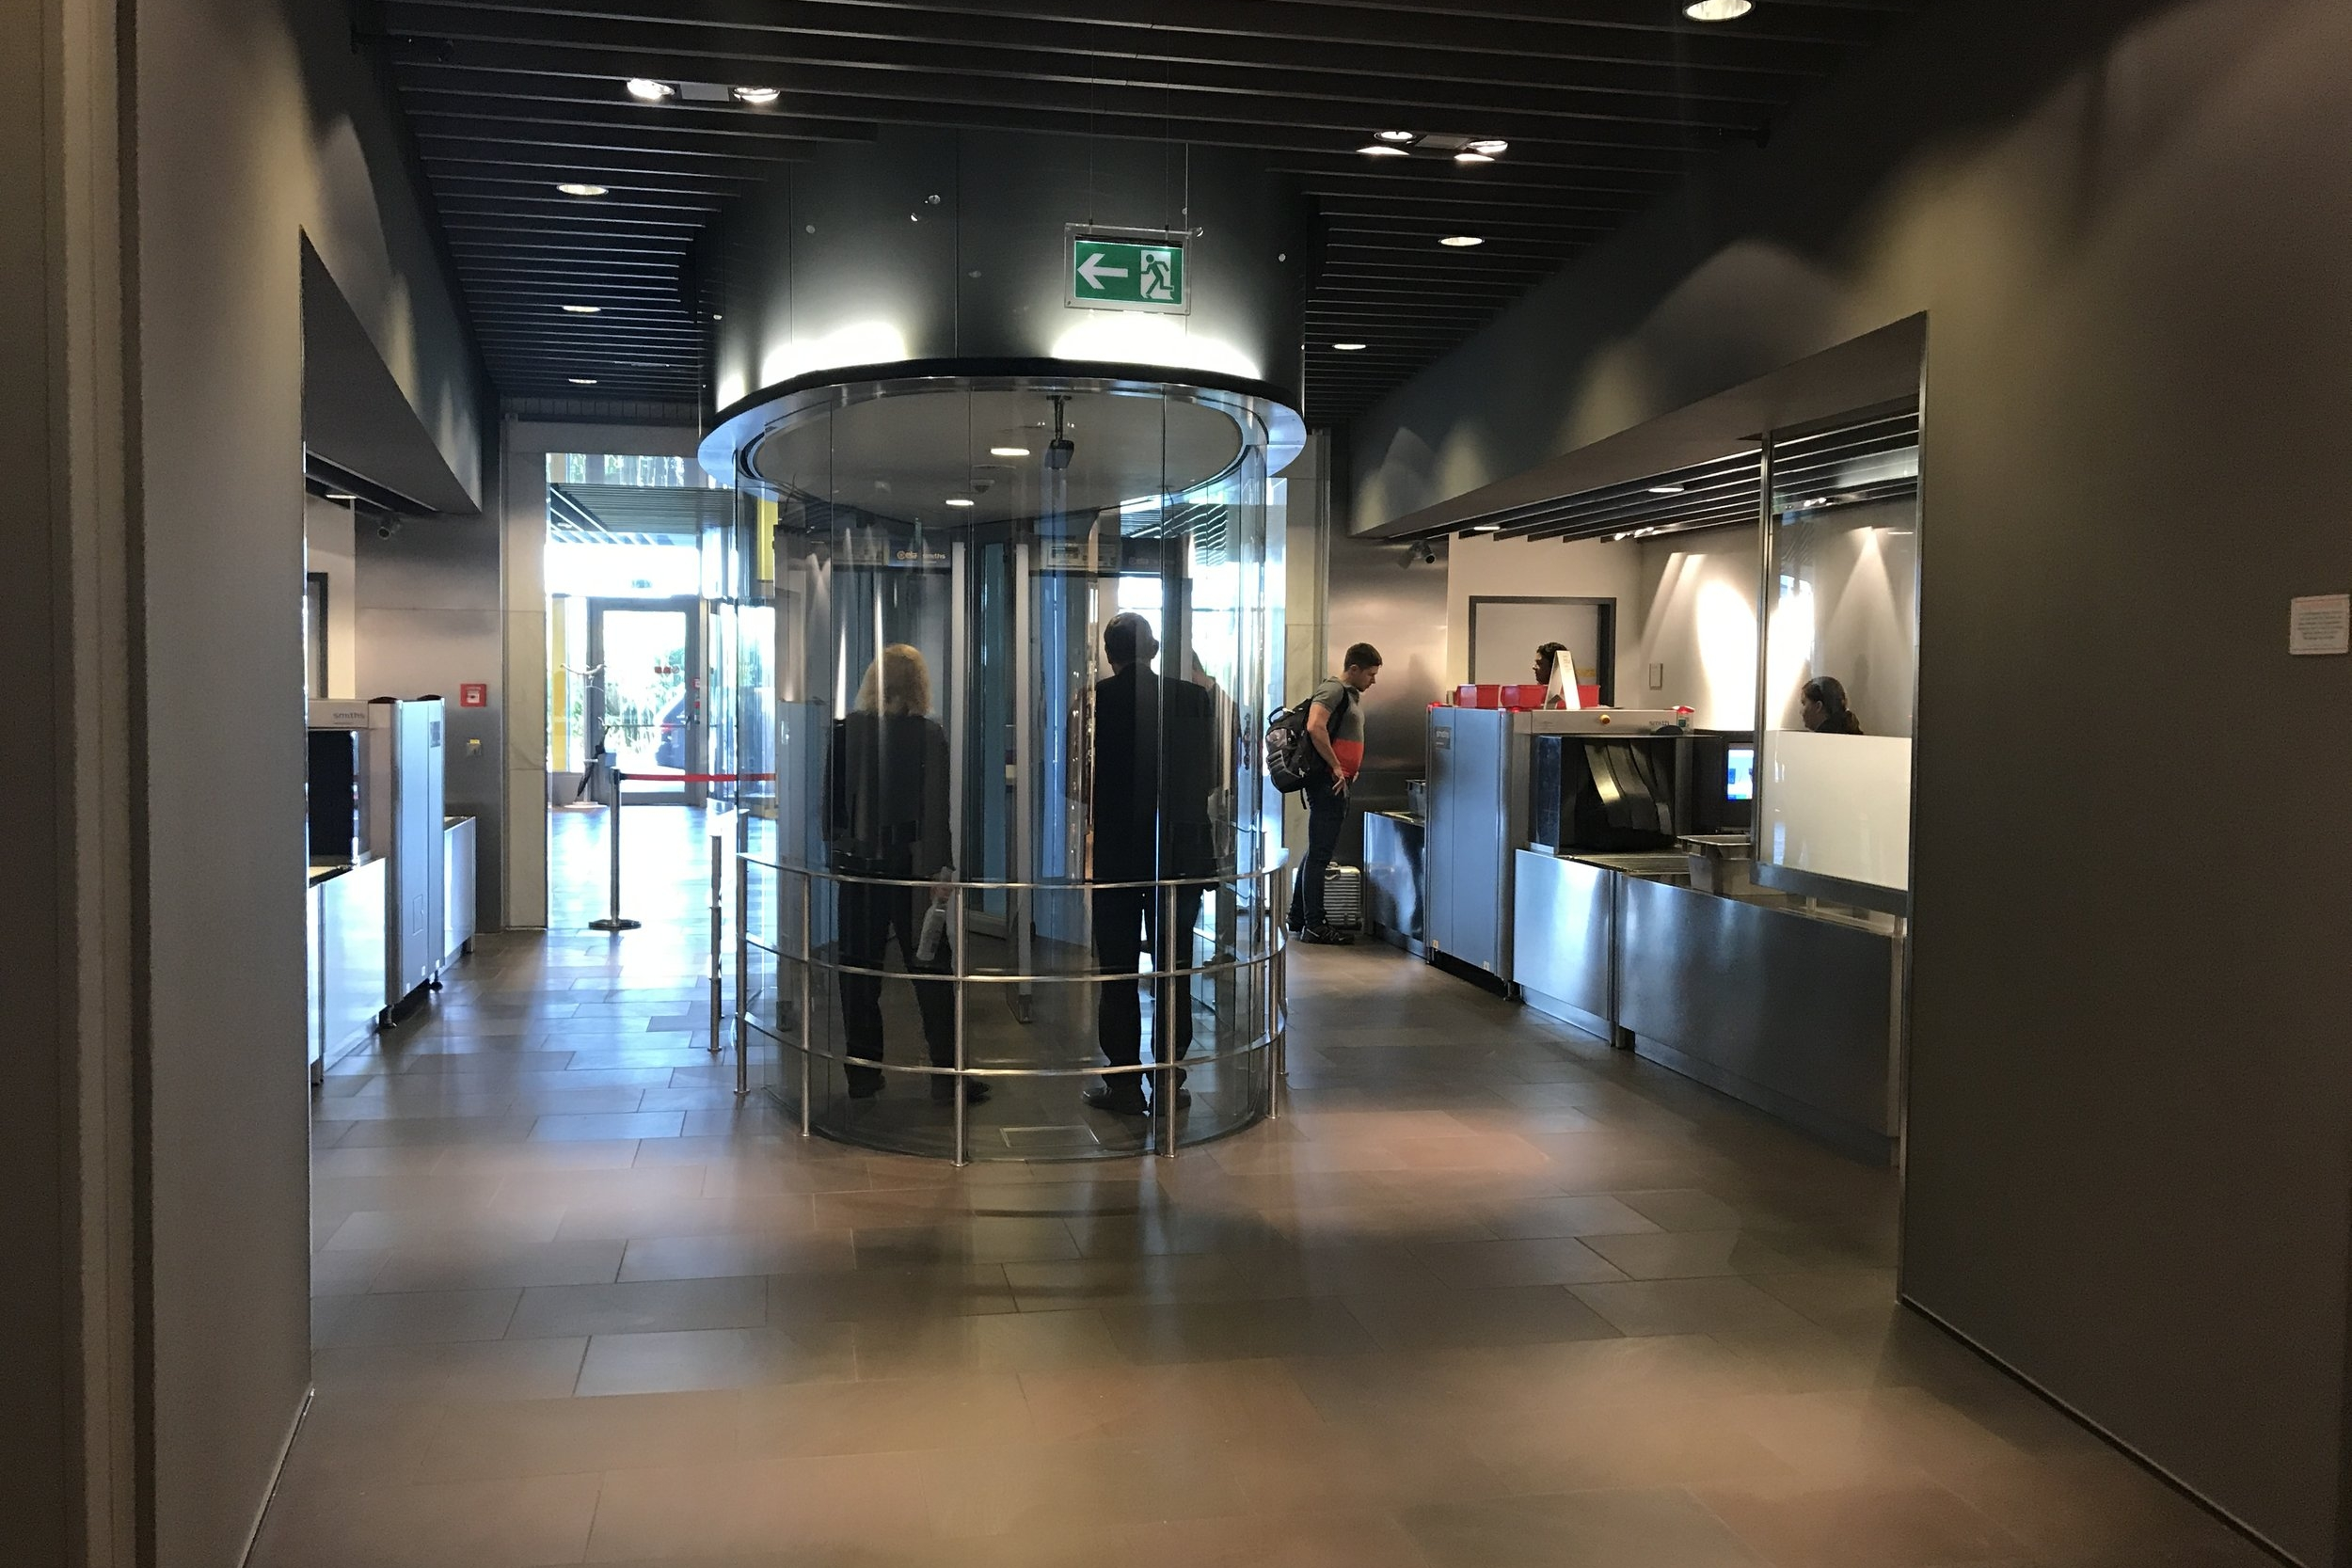 Lufthansa First Class Terminal Frankfurt – Security checkpoint